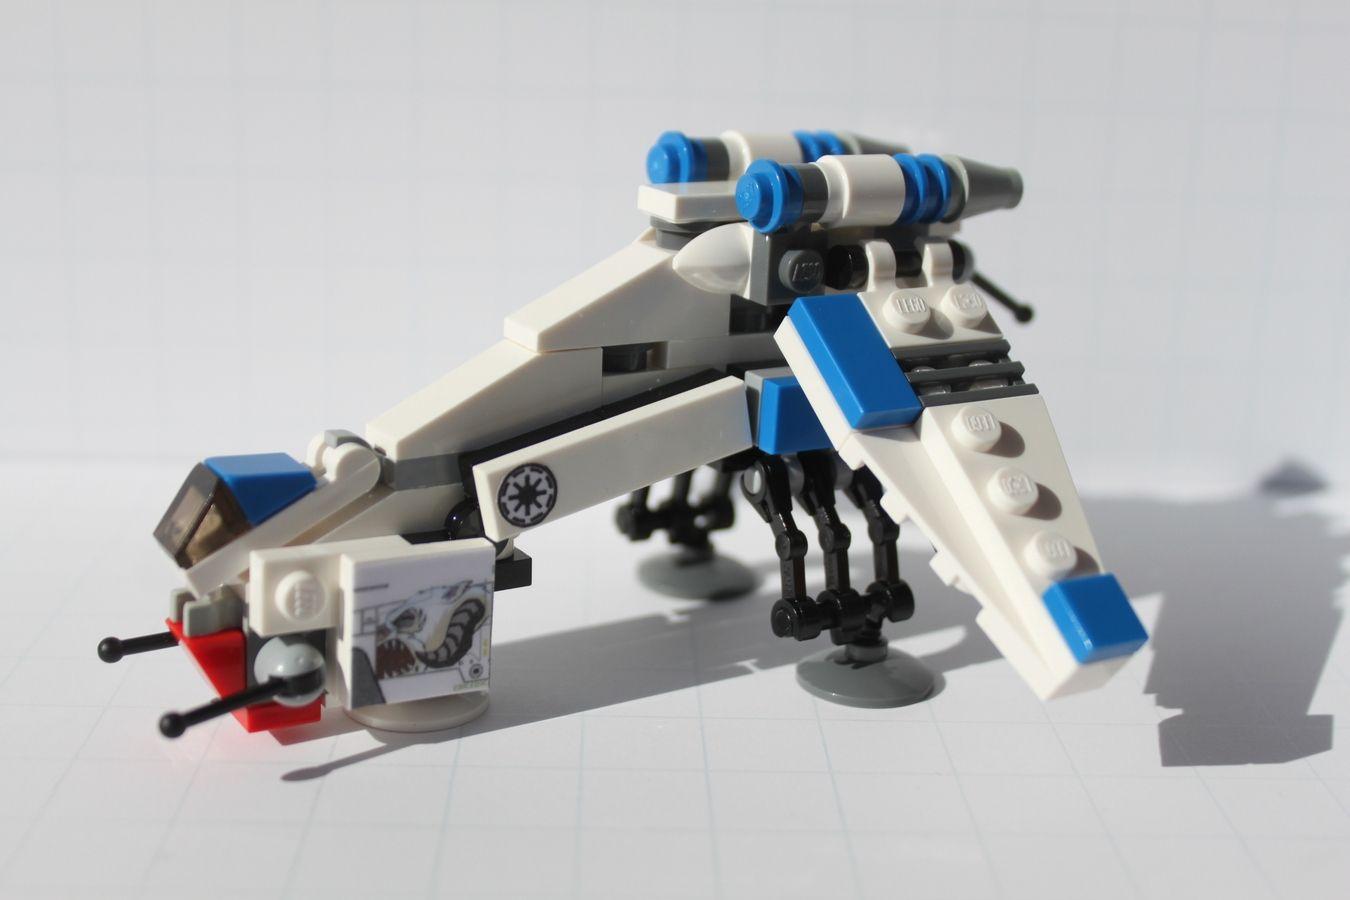 Lego Star Wars Mini Republic Dropship Laatc Wampa Runner